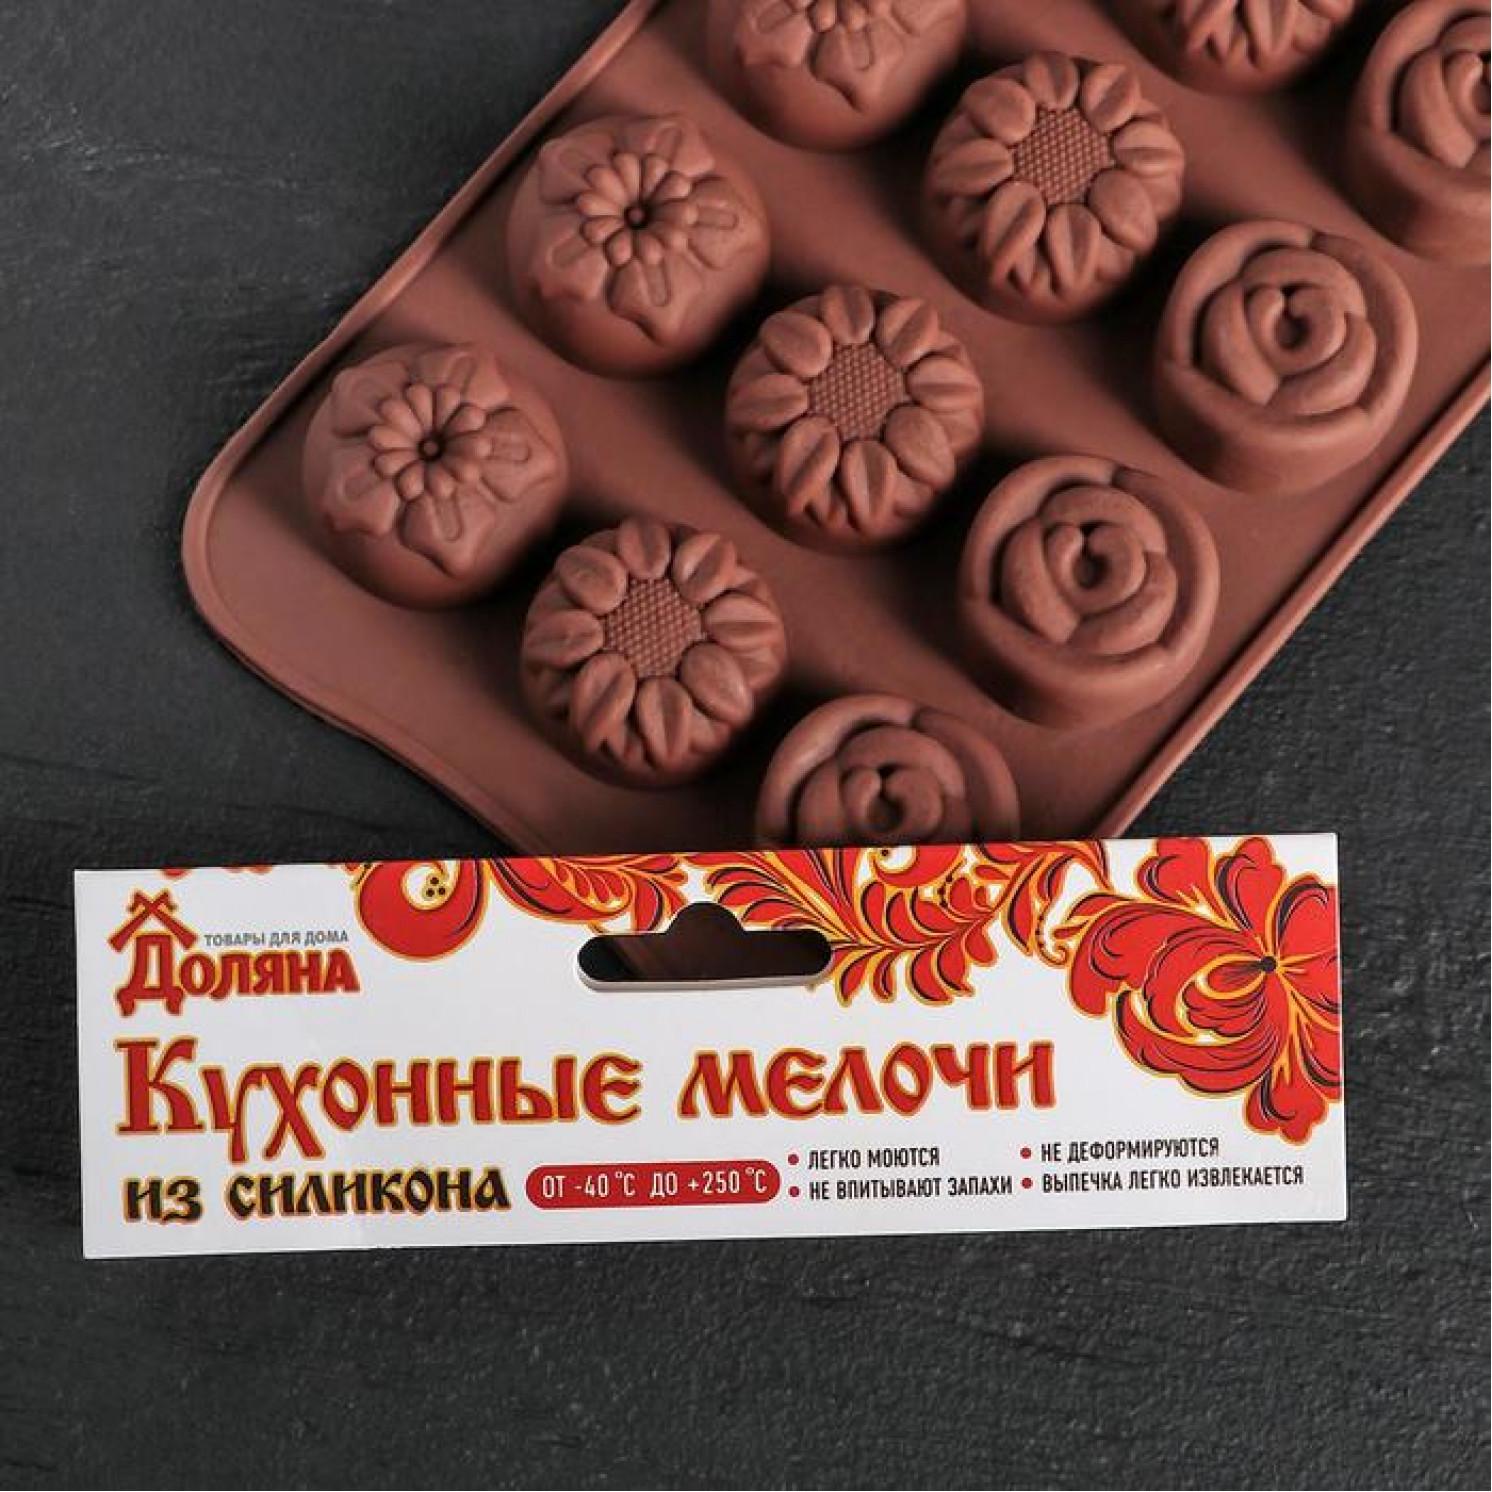 "Форма для льда и шоколада 20,5х10,5х1,5 см ""Клумба цветов"", 15 ячеек"